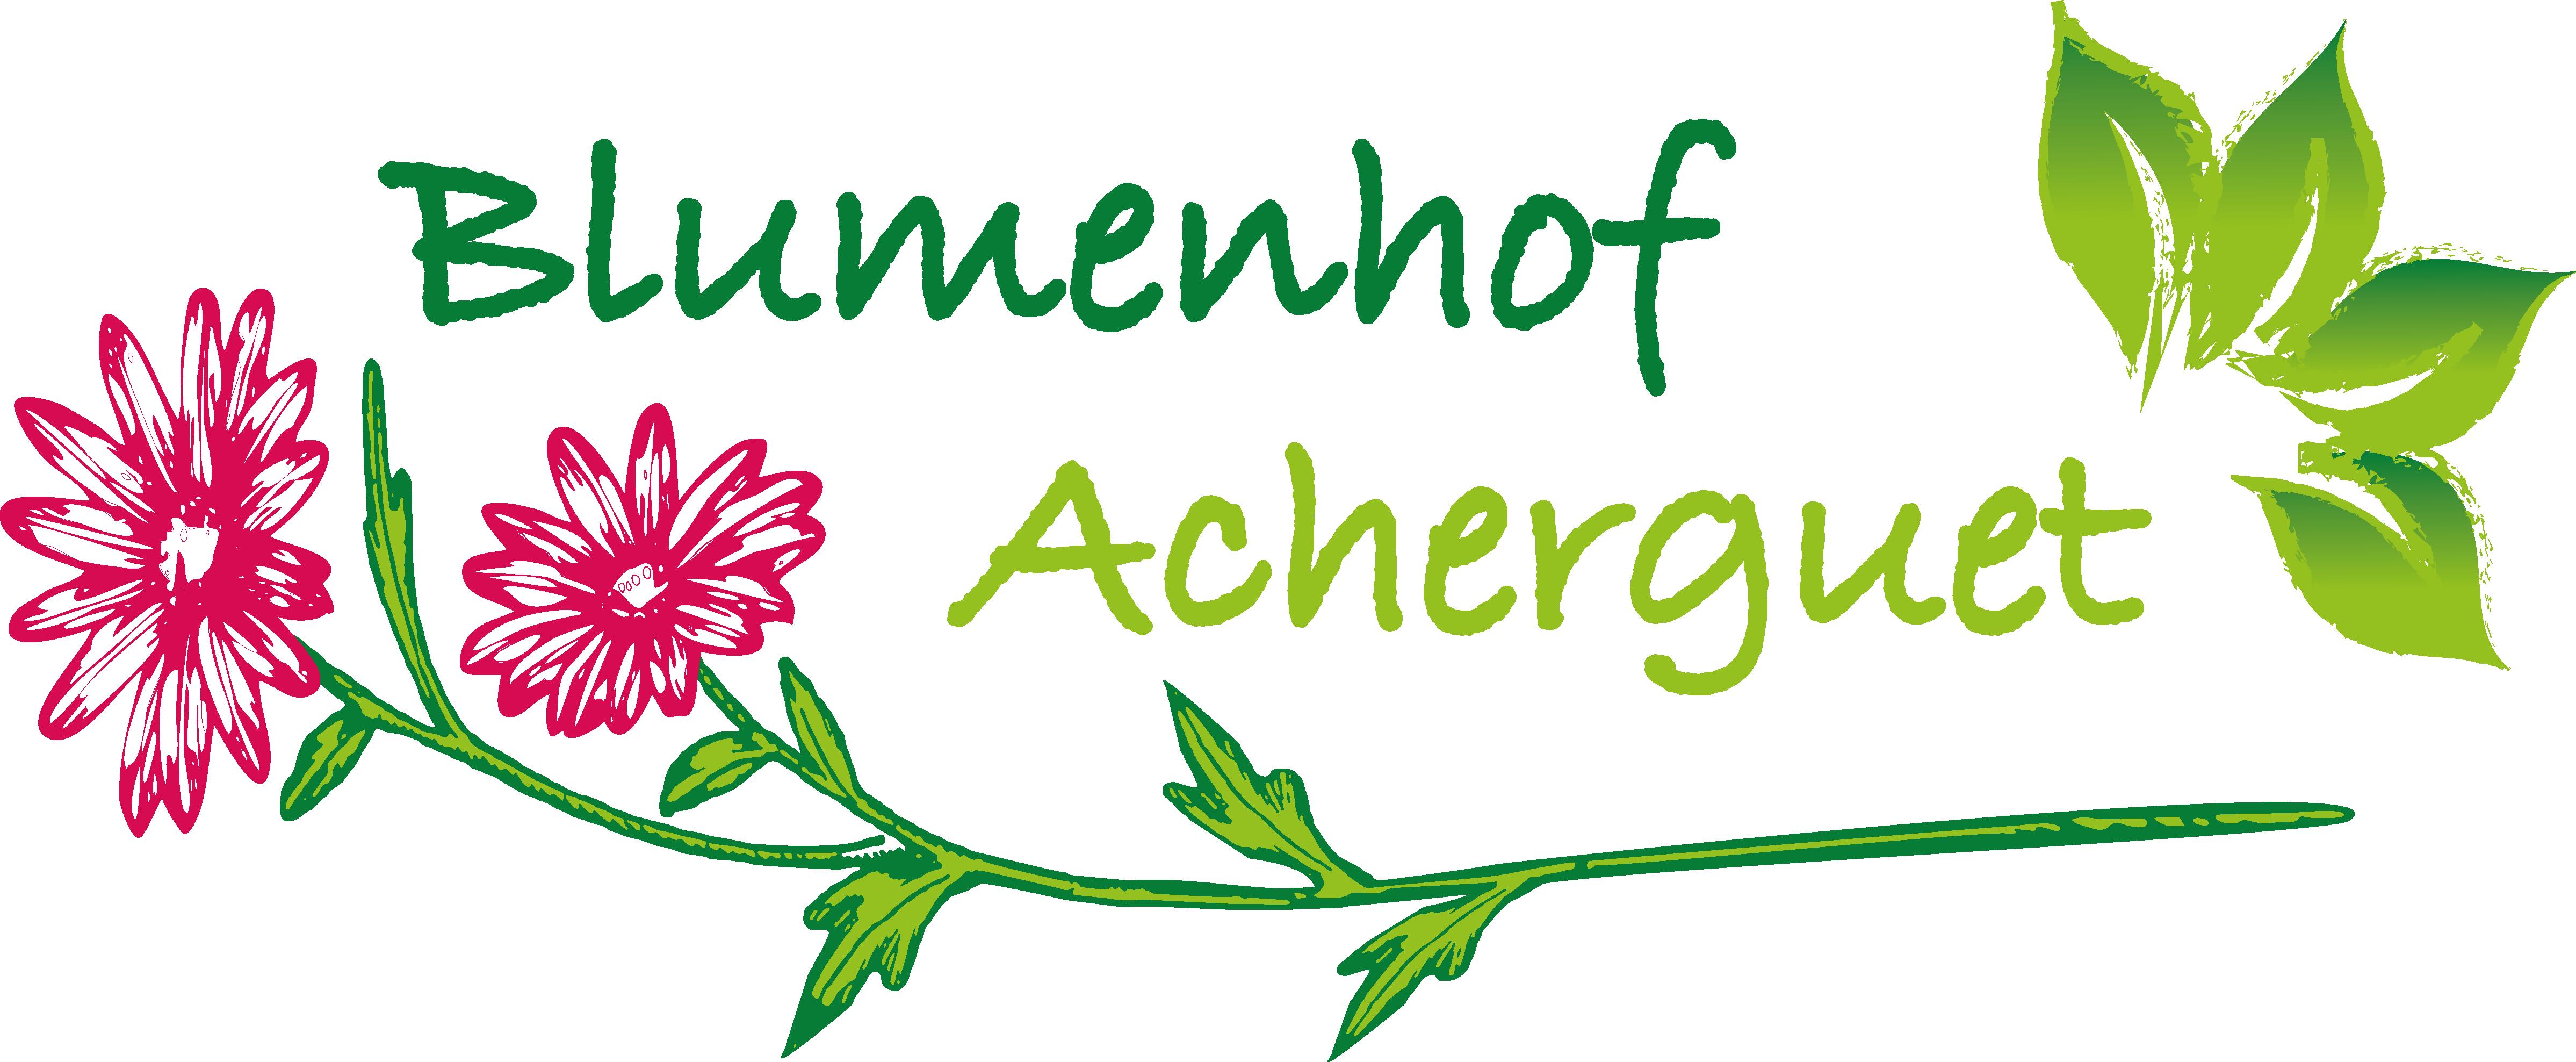 Blumenhof Acherguet, Schüpfheim